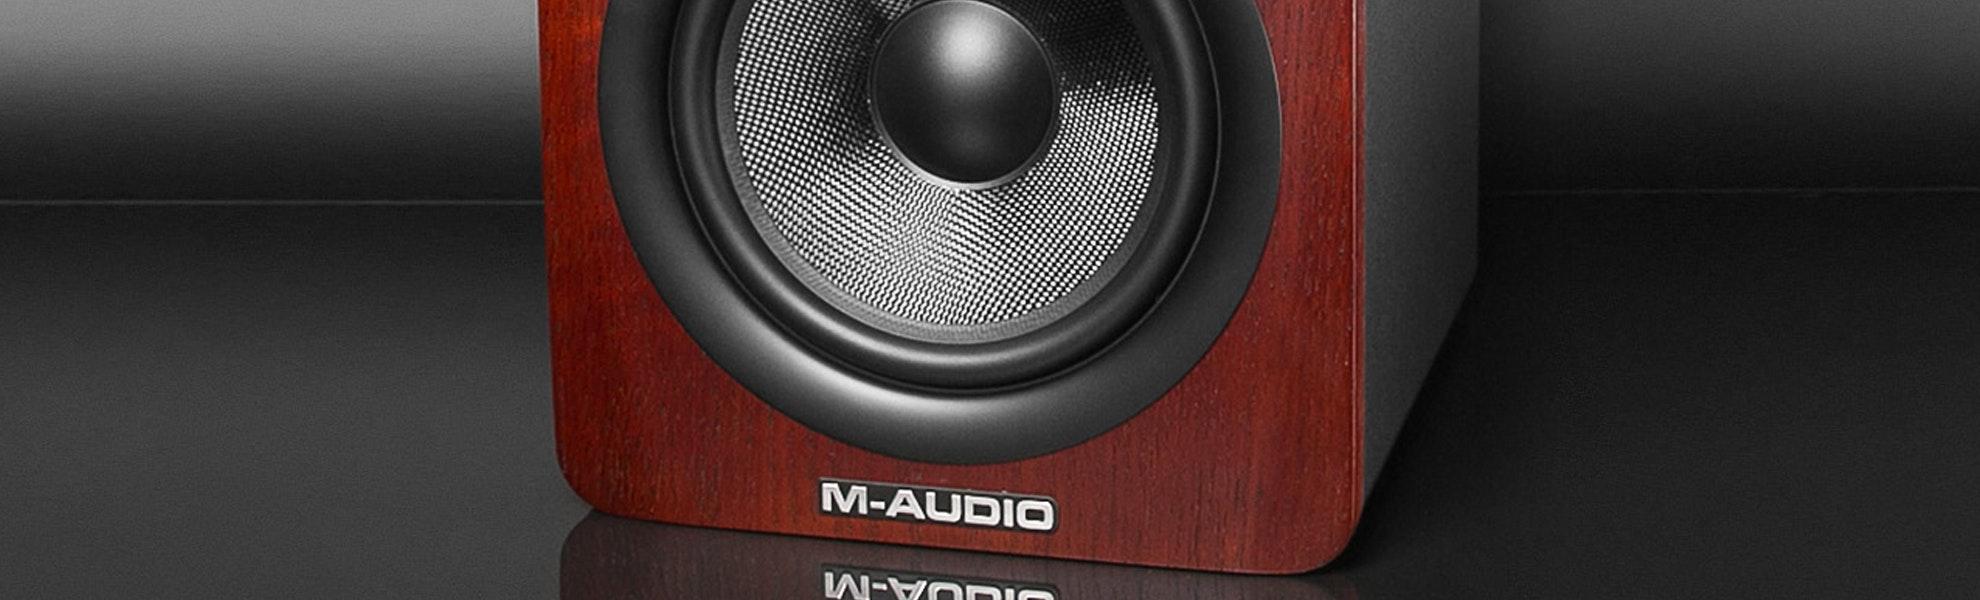 M-Audio M3-8 Three-Way Studio Monitor